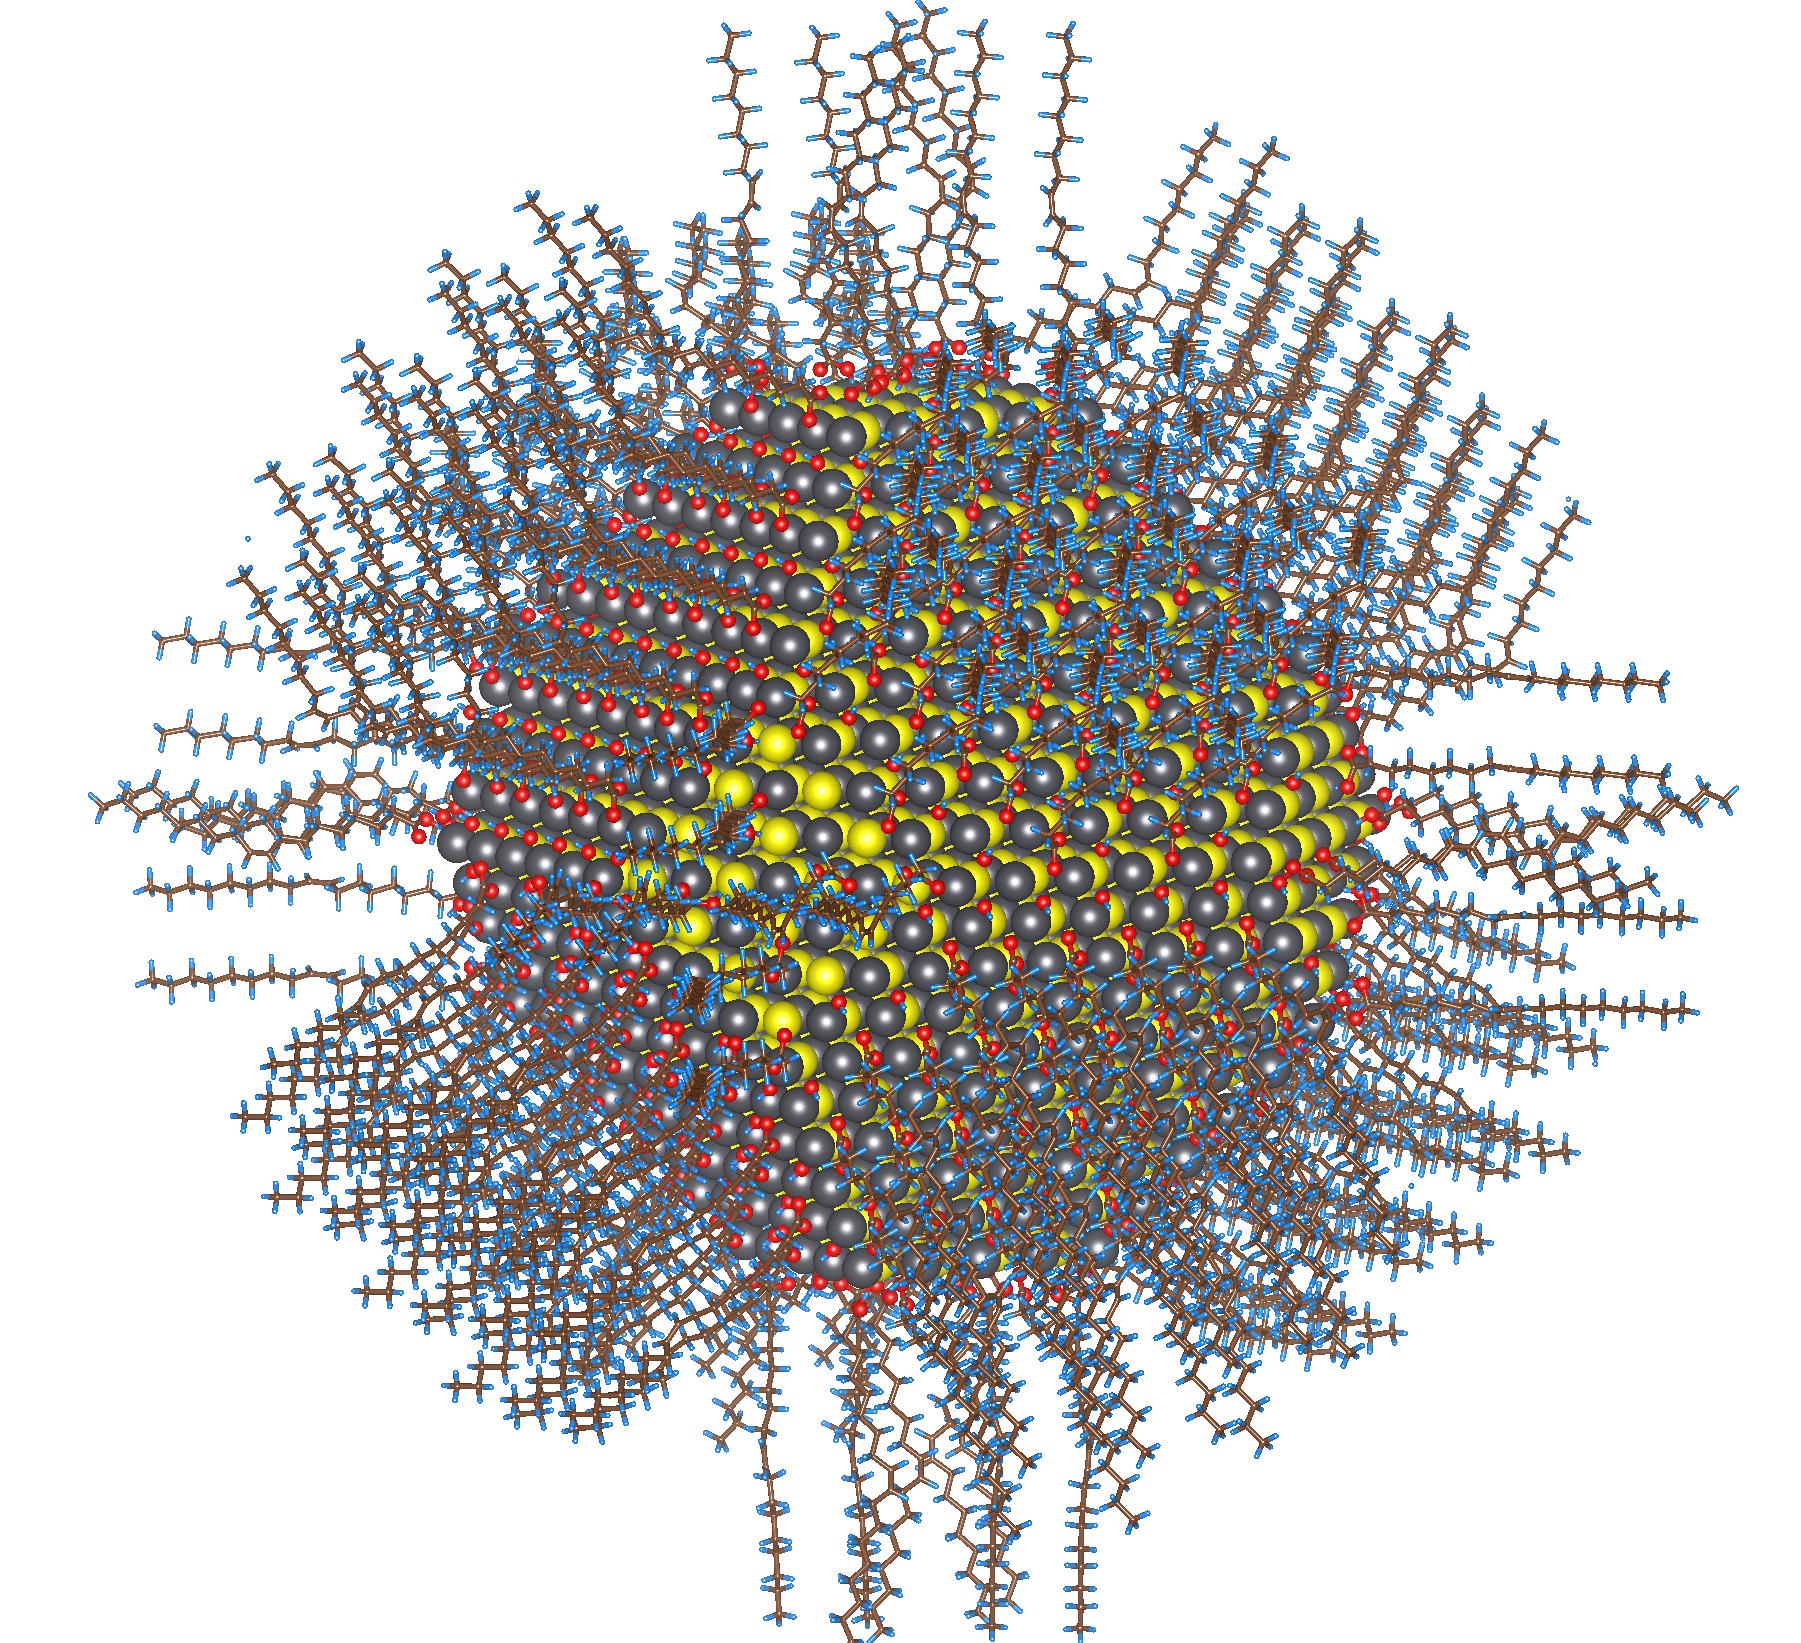 https://www.olcf.ornl.gov/wp-content/uploads/2015/05/colloidal_nanoparticle.png